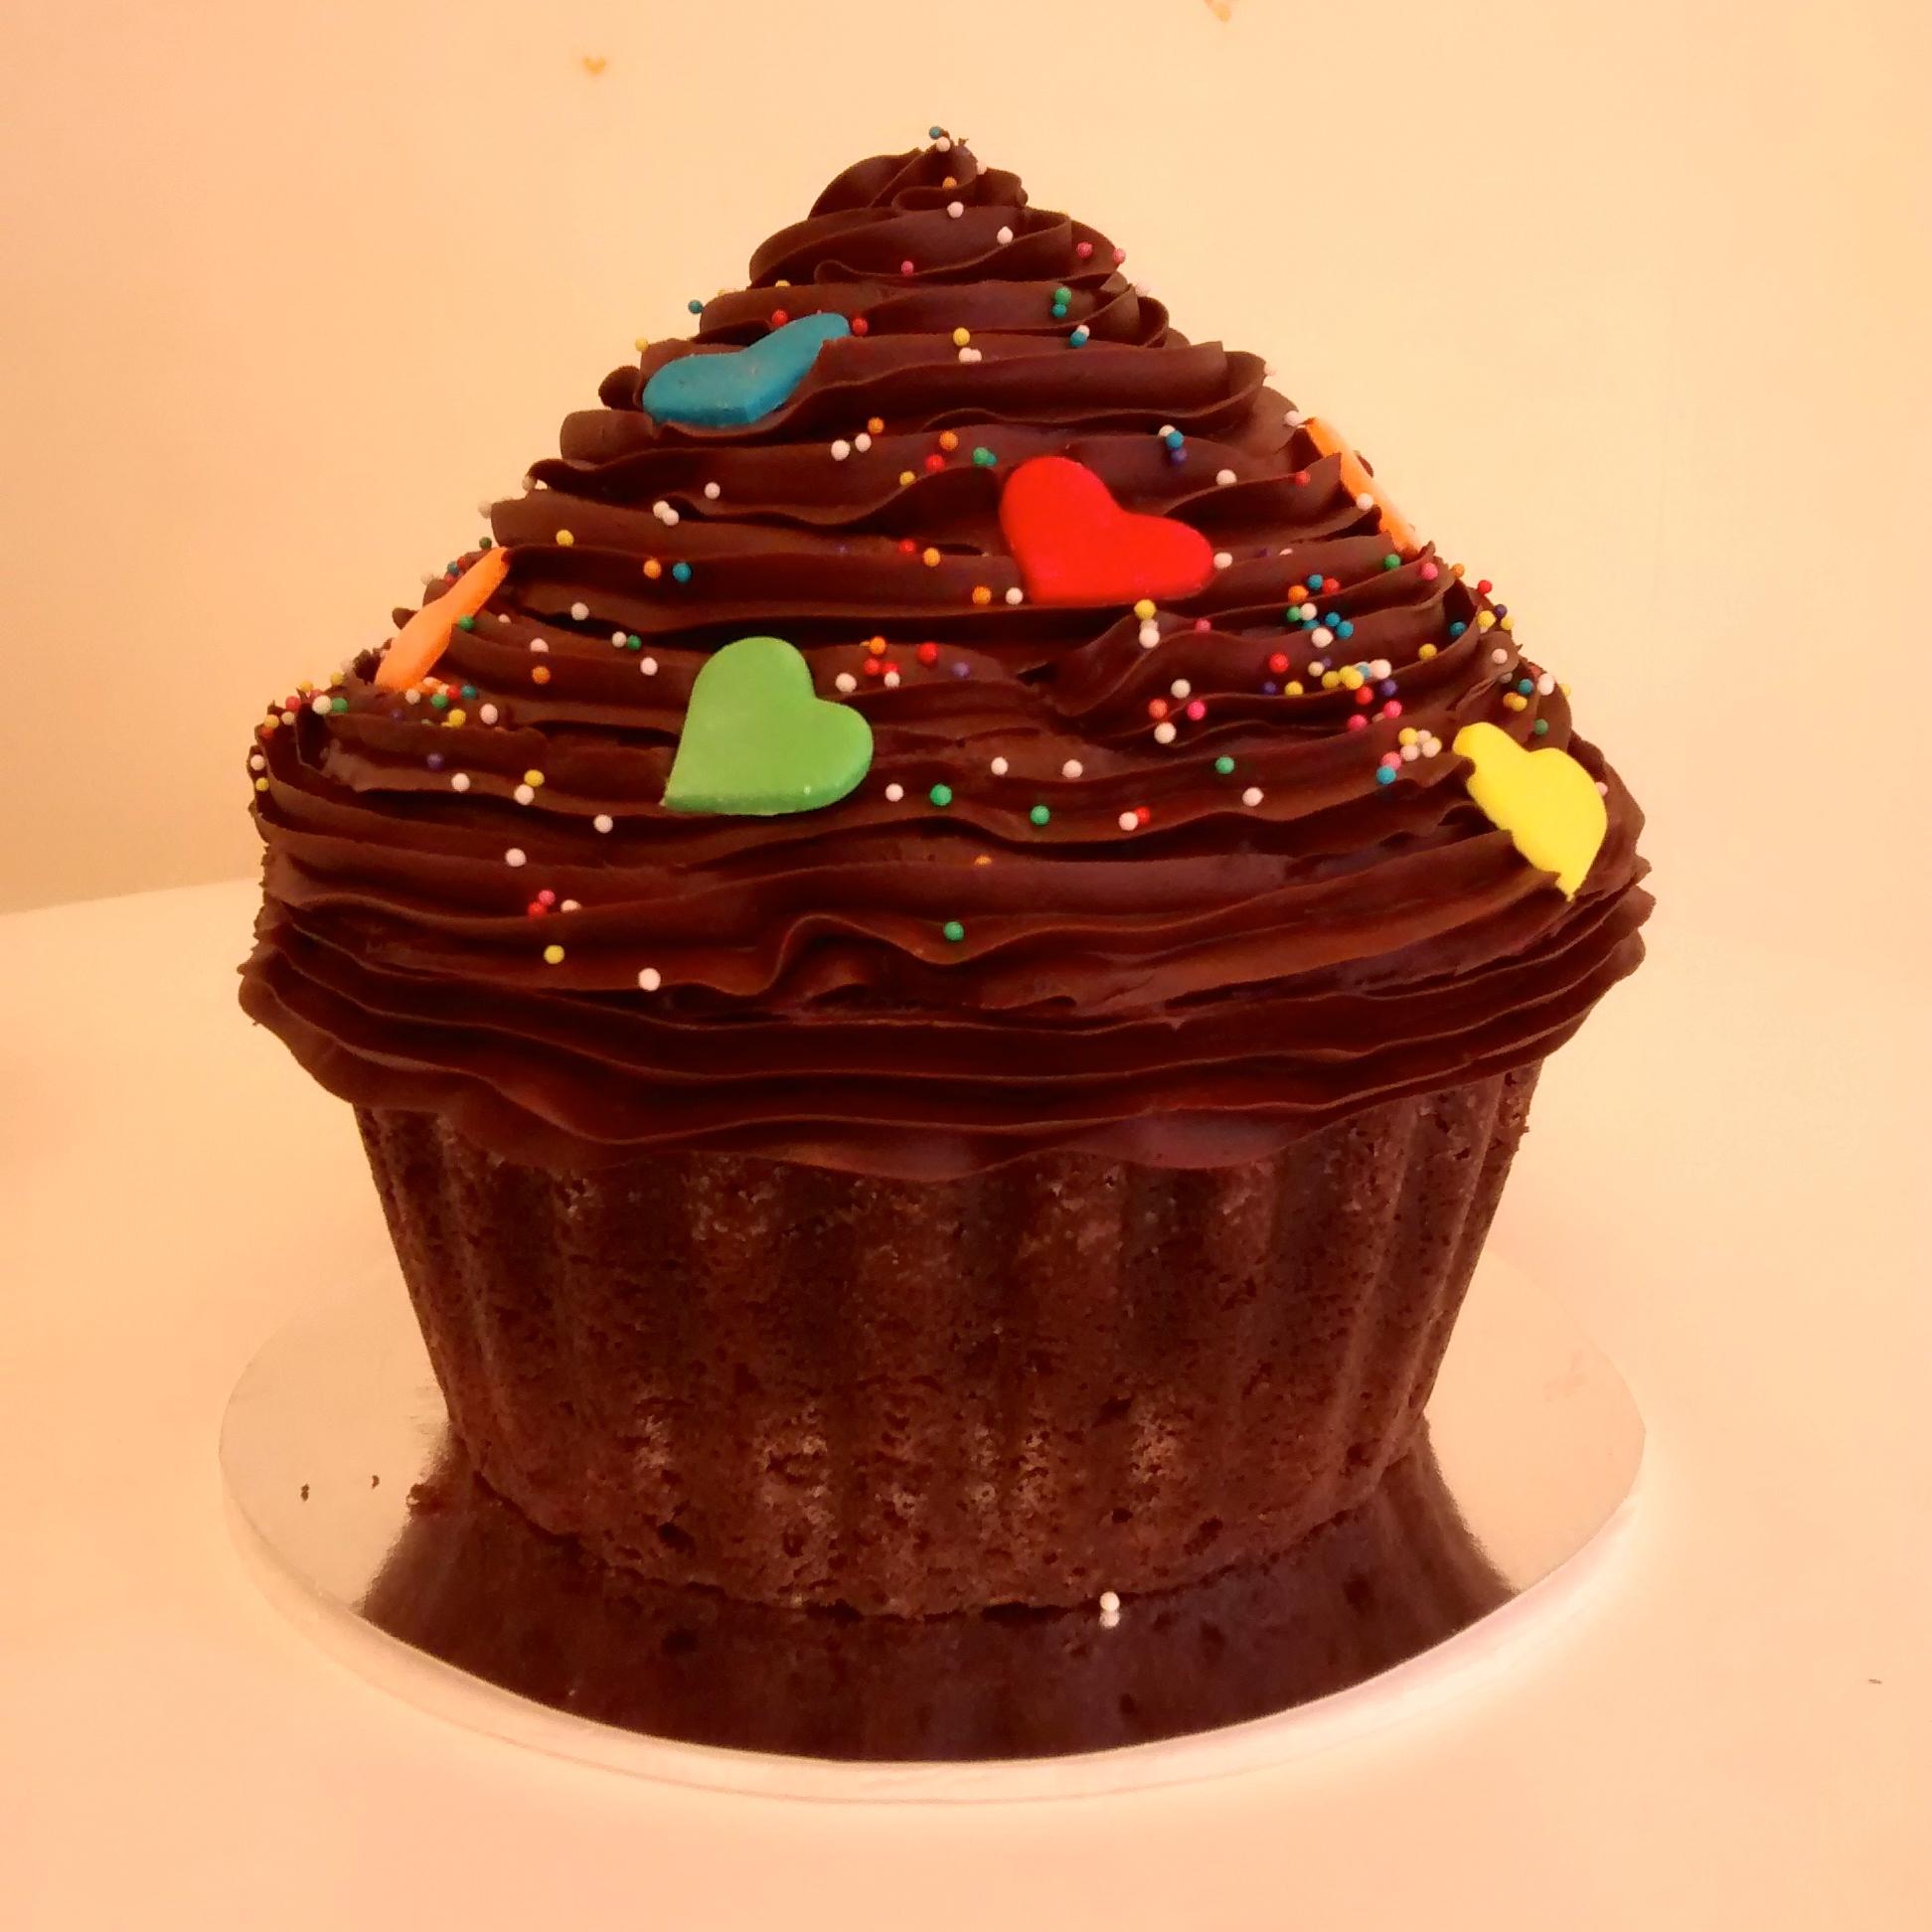 bolo cupcake 4.jpg